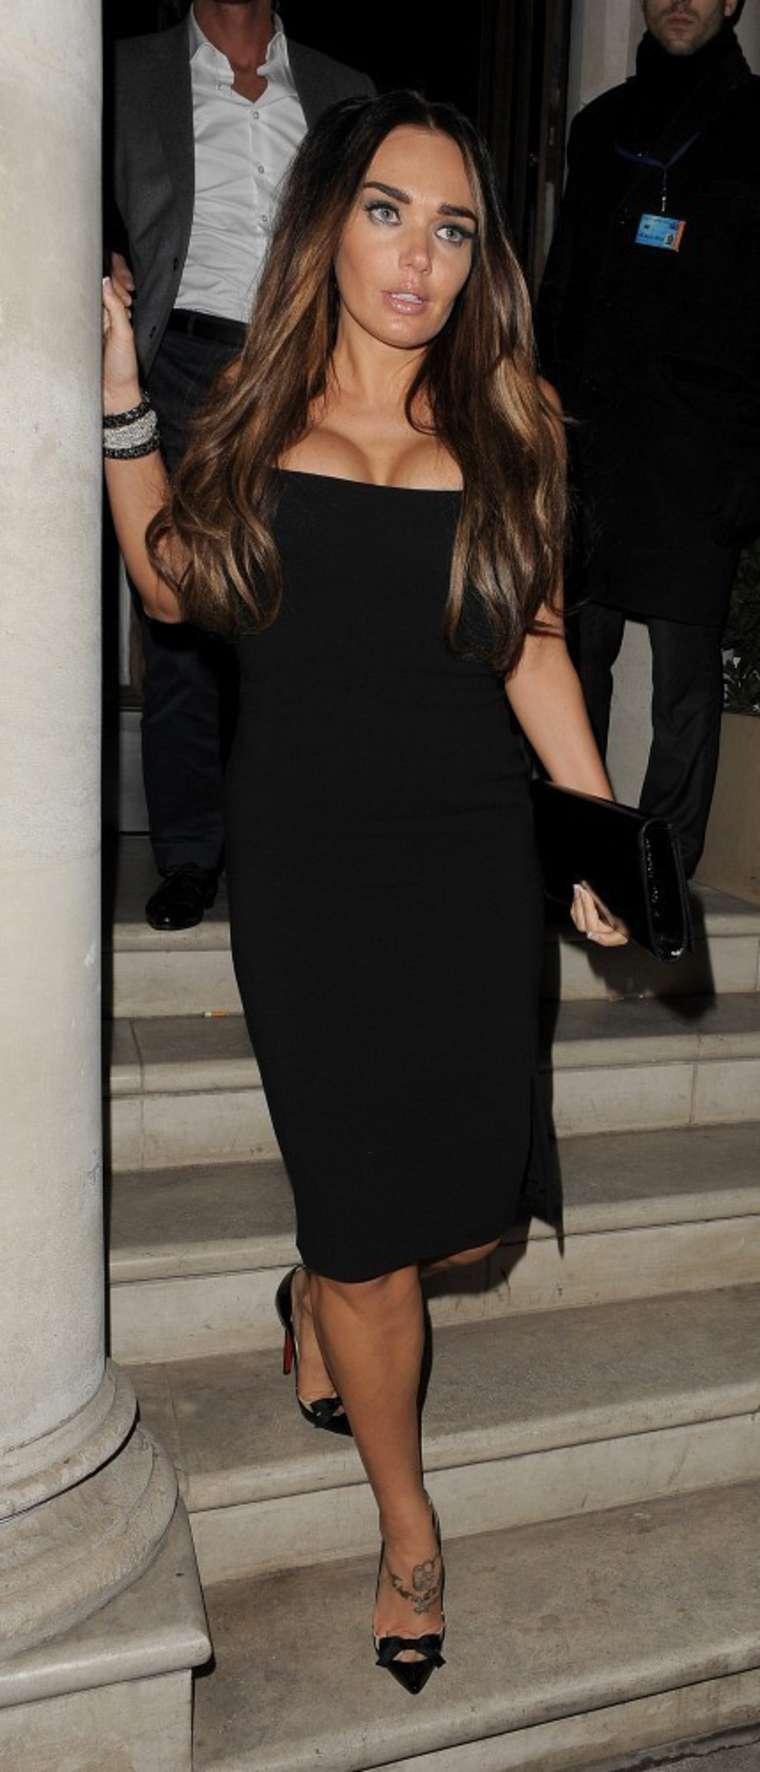 Tamara Ecclestone In Black Dress -05 - GotCeleb Rihanna